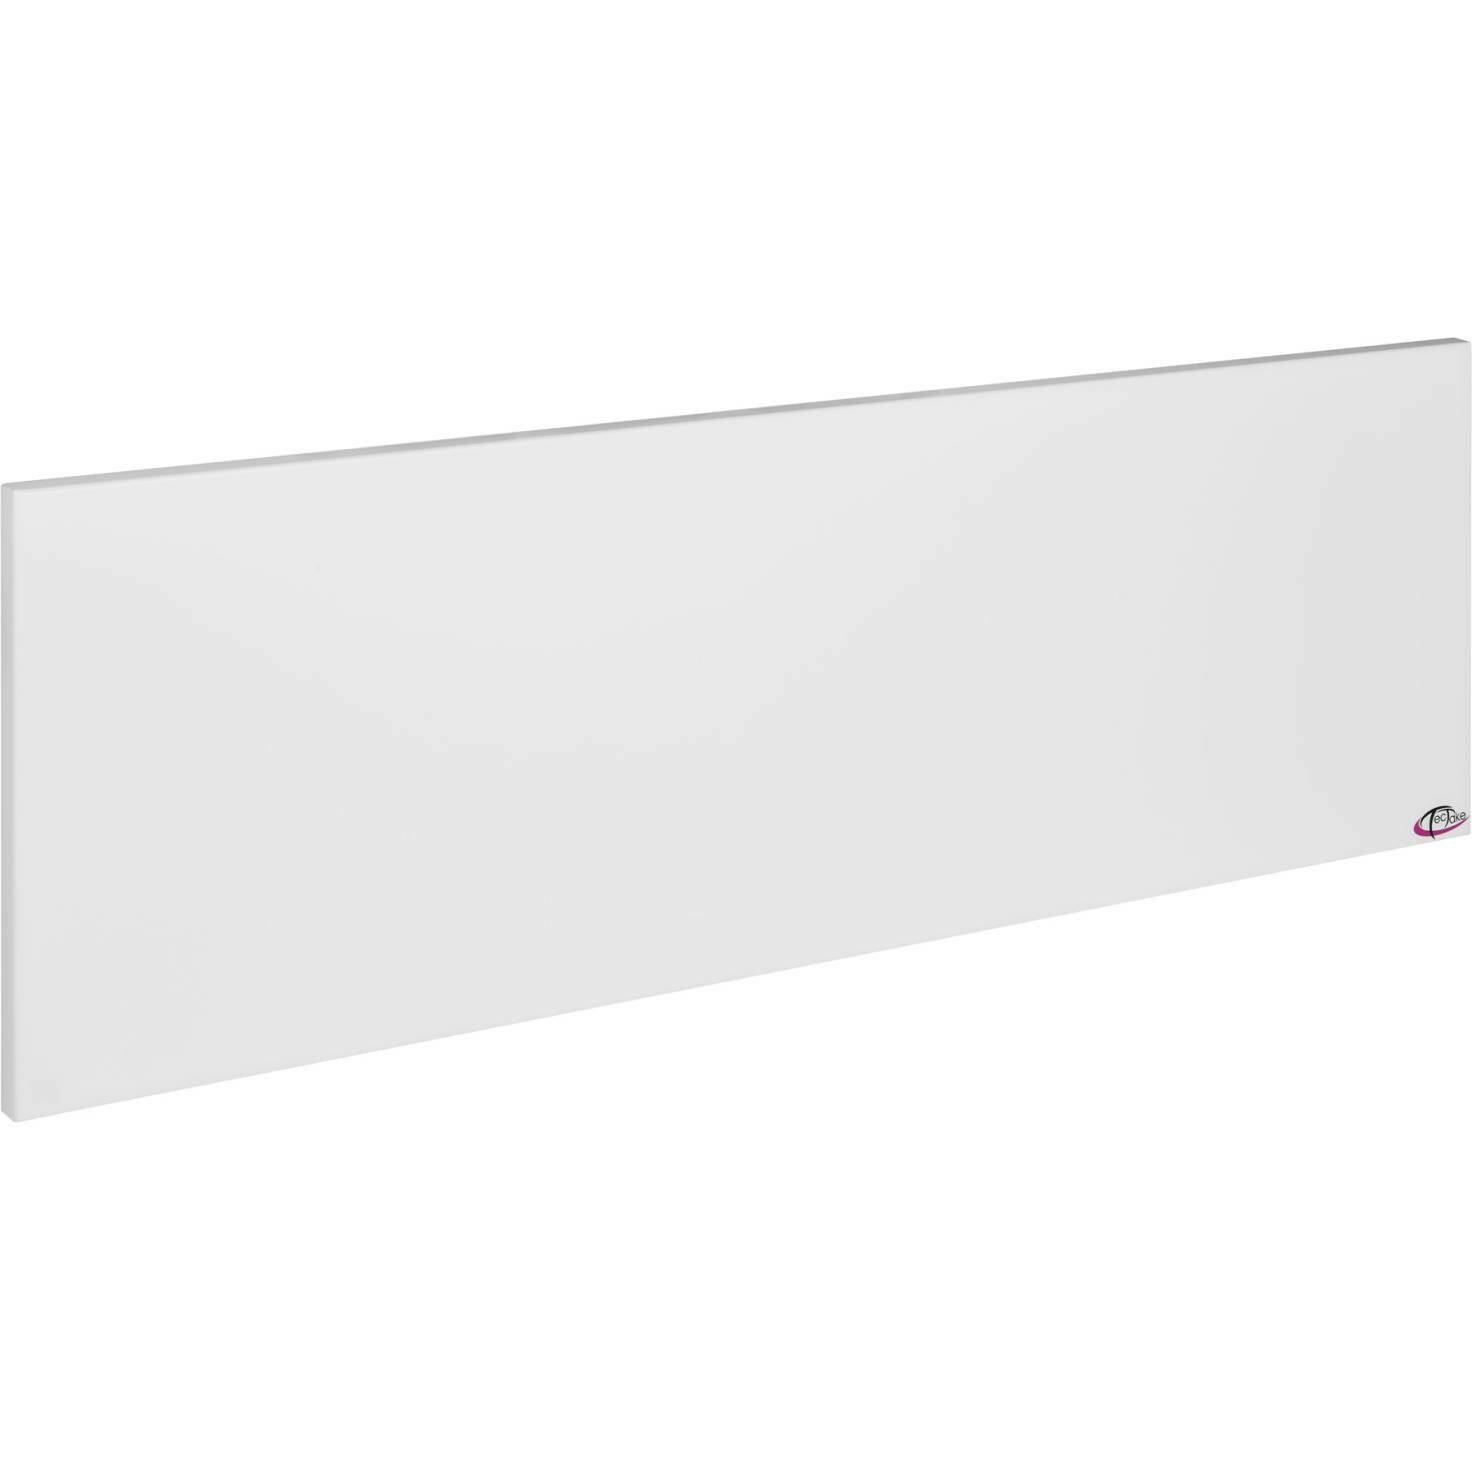 TEC TAKE CLASSIC 550 W